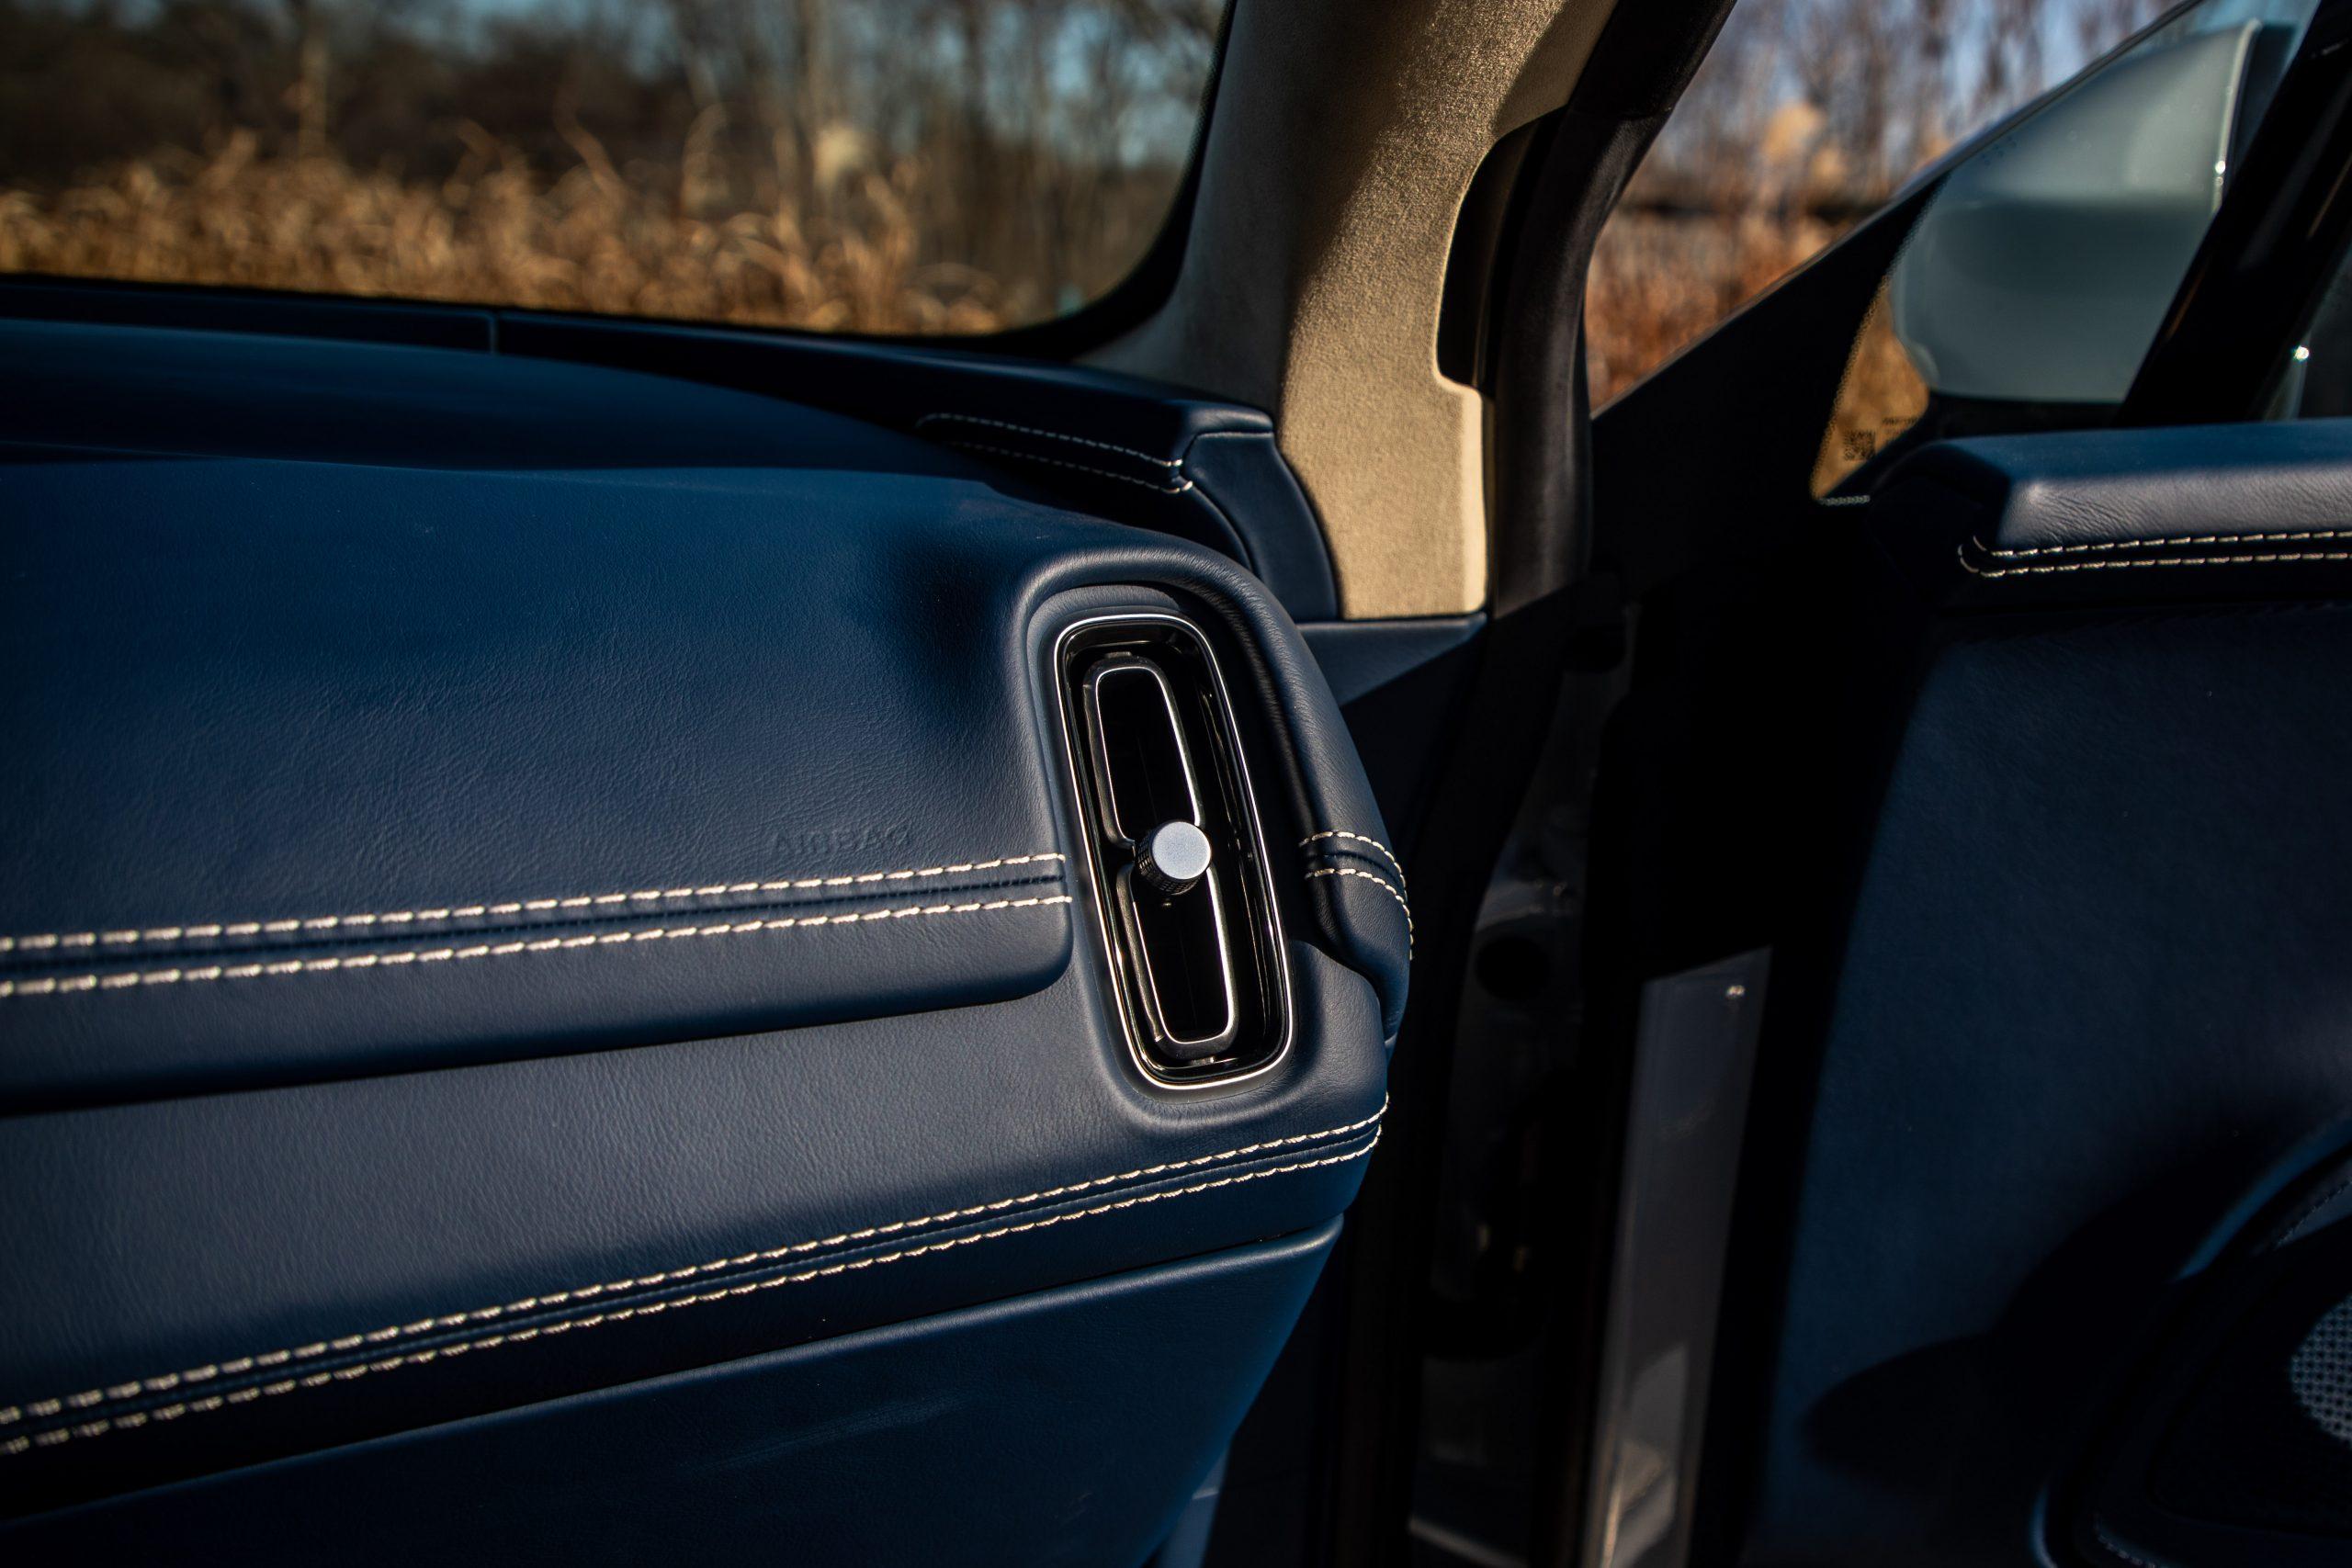 2021 Aston Martin DBX interior vent